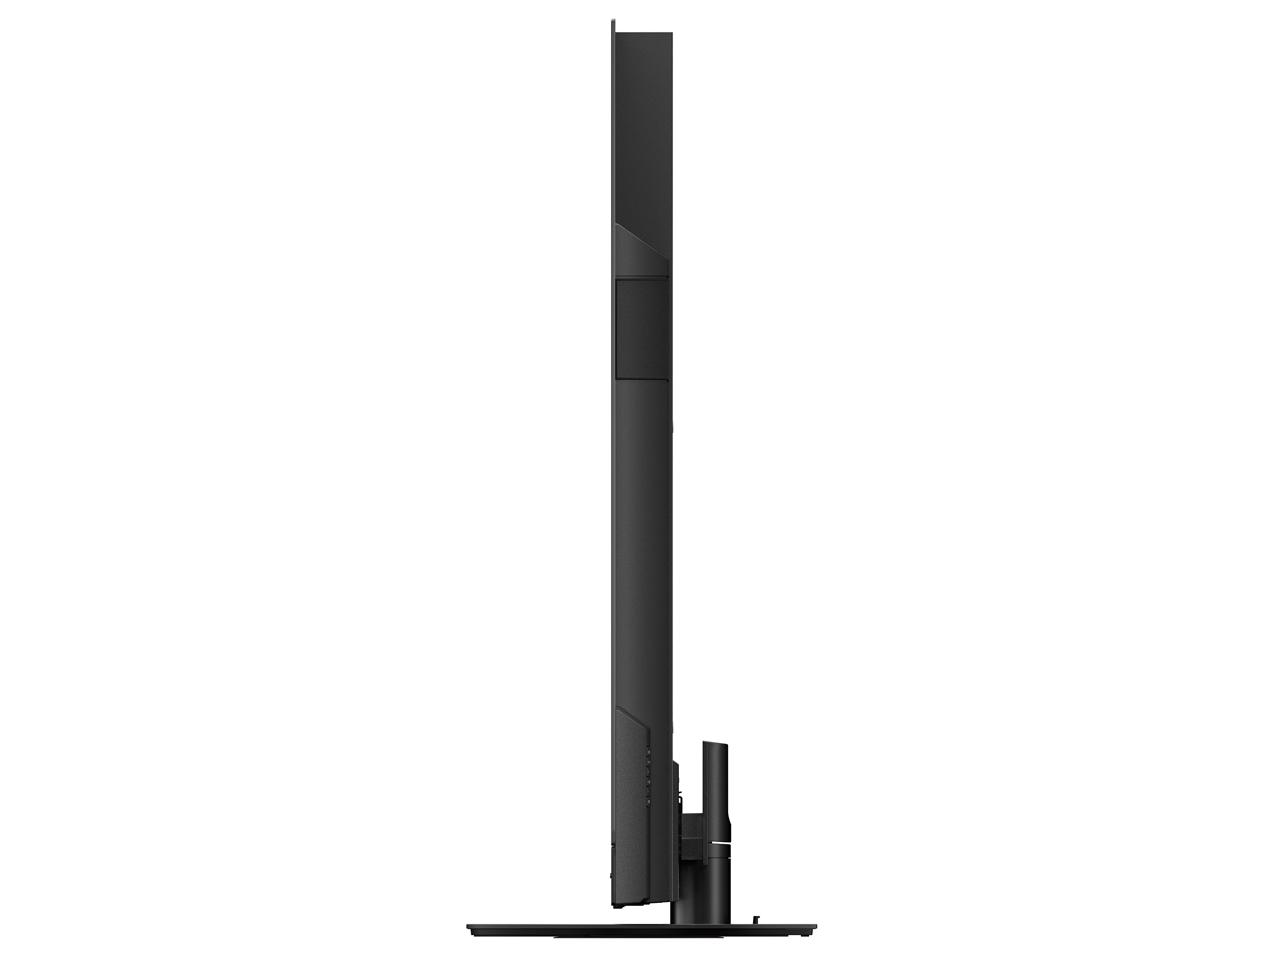 VIERA TH-65JZ2000 [65インチ] の製品画像